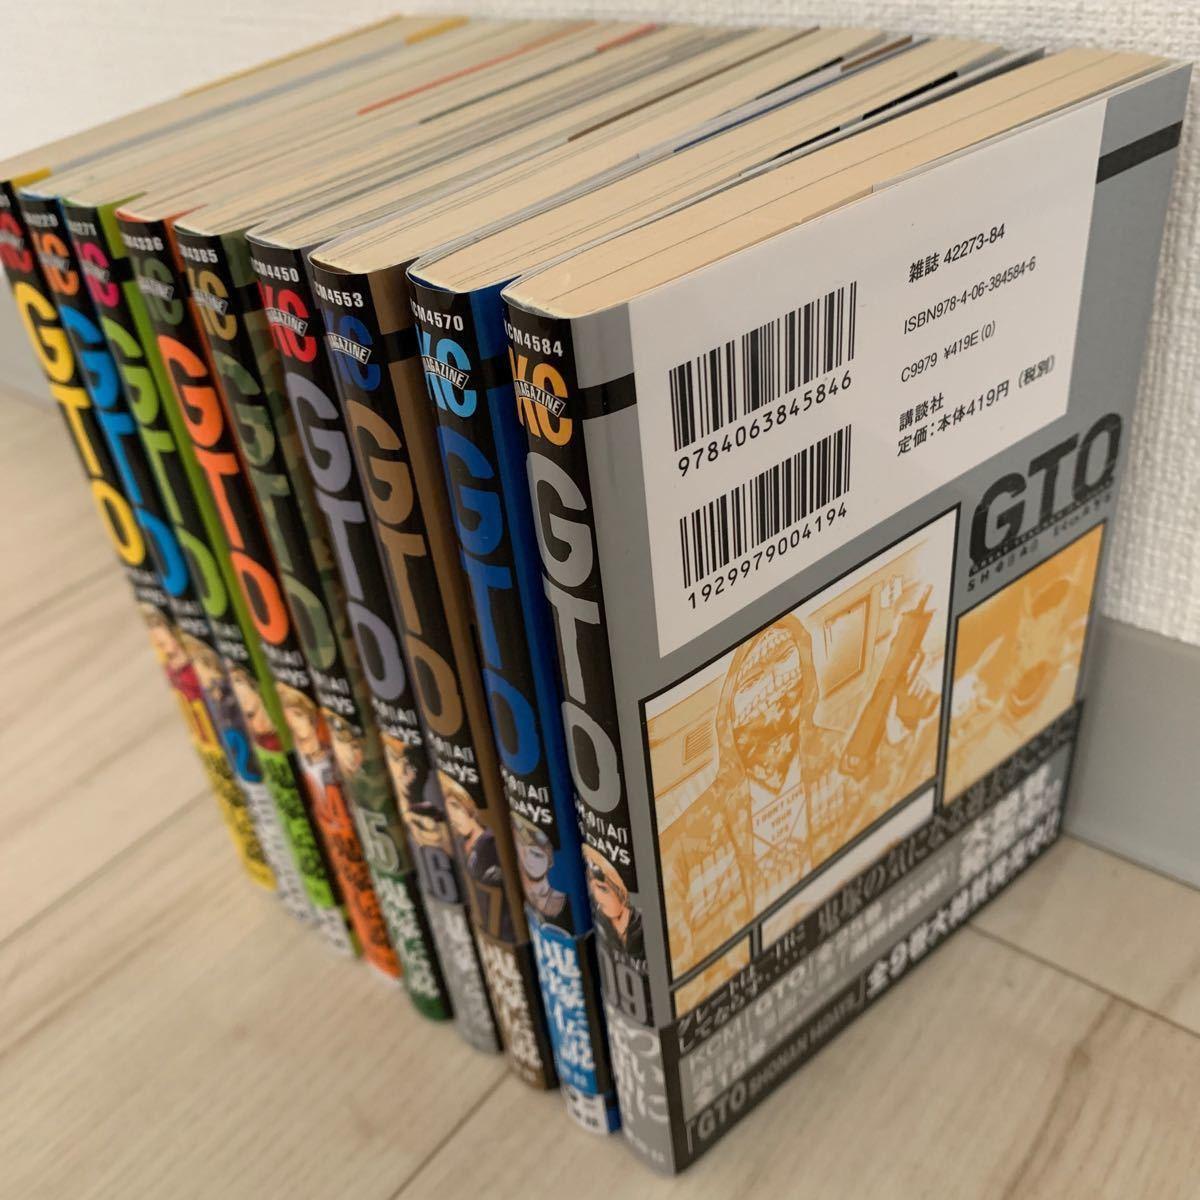 【全巻セット】【完結】GTO SHONAN 14DAYS  1〜9巻